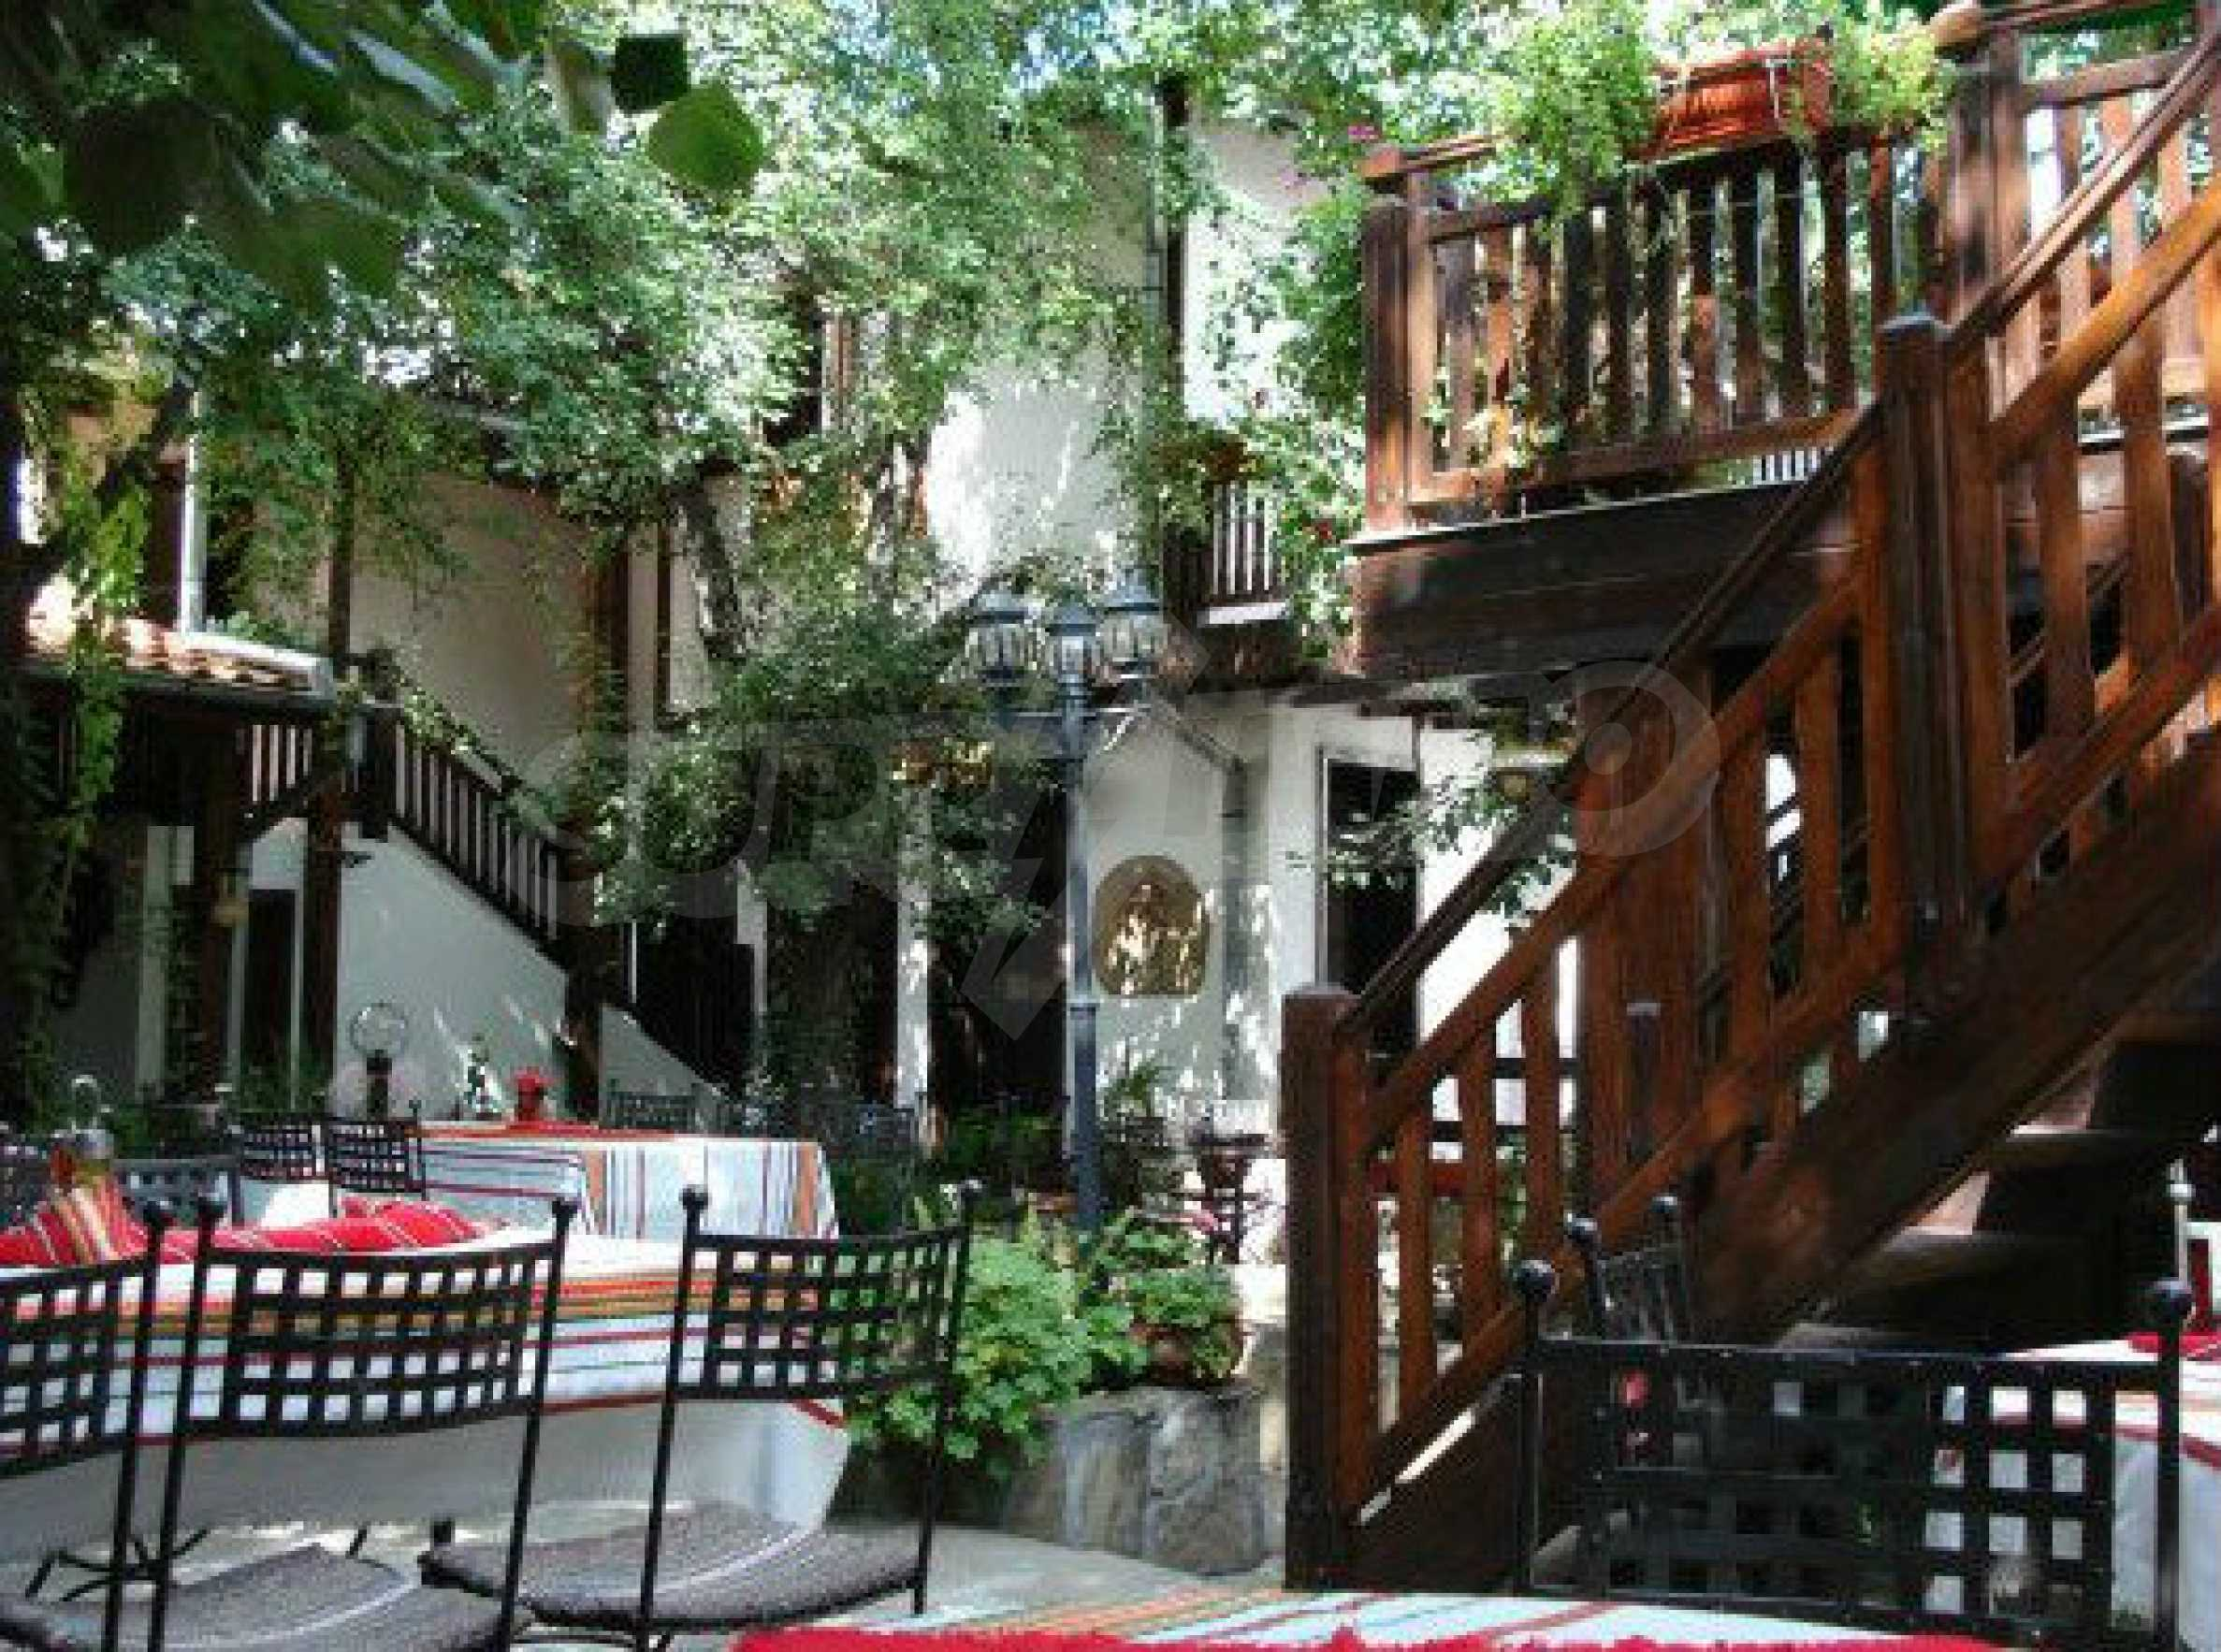 Hotelanlage mit Restaurant am Ufer des Flusses Osam in Lovech 68